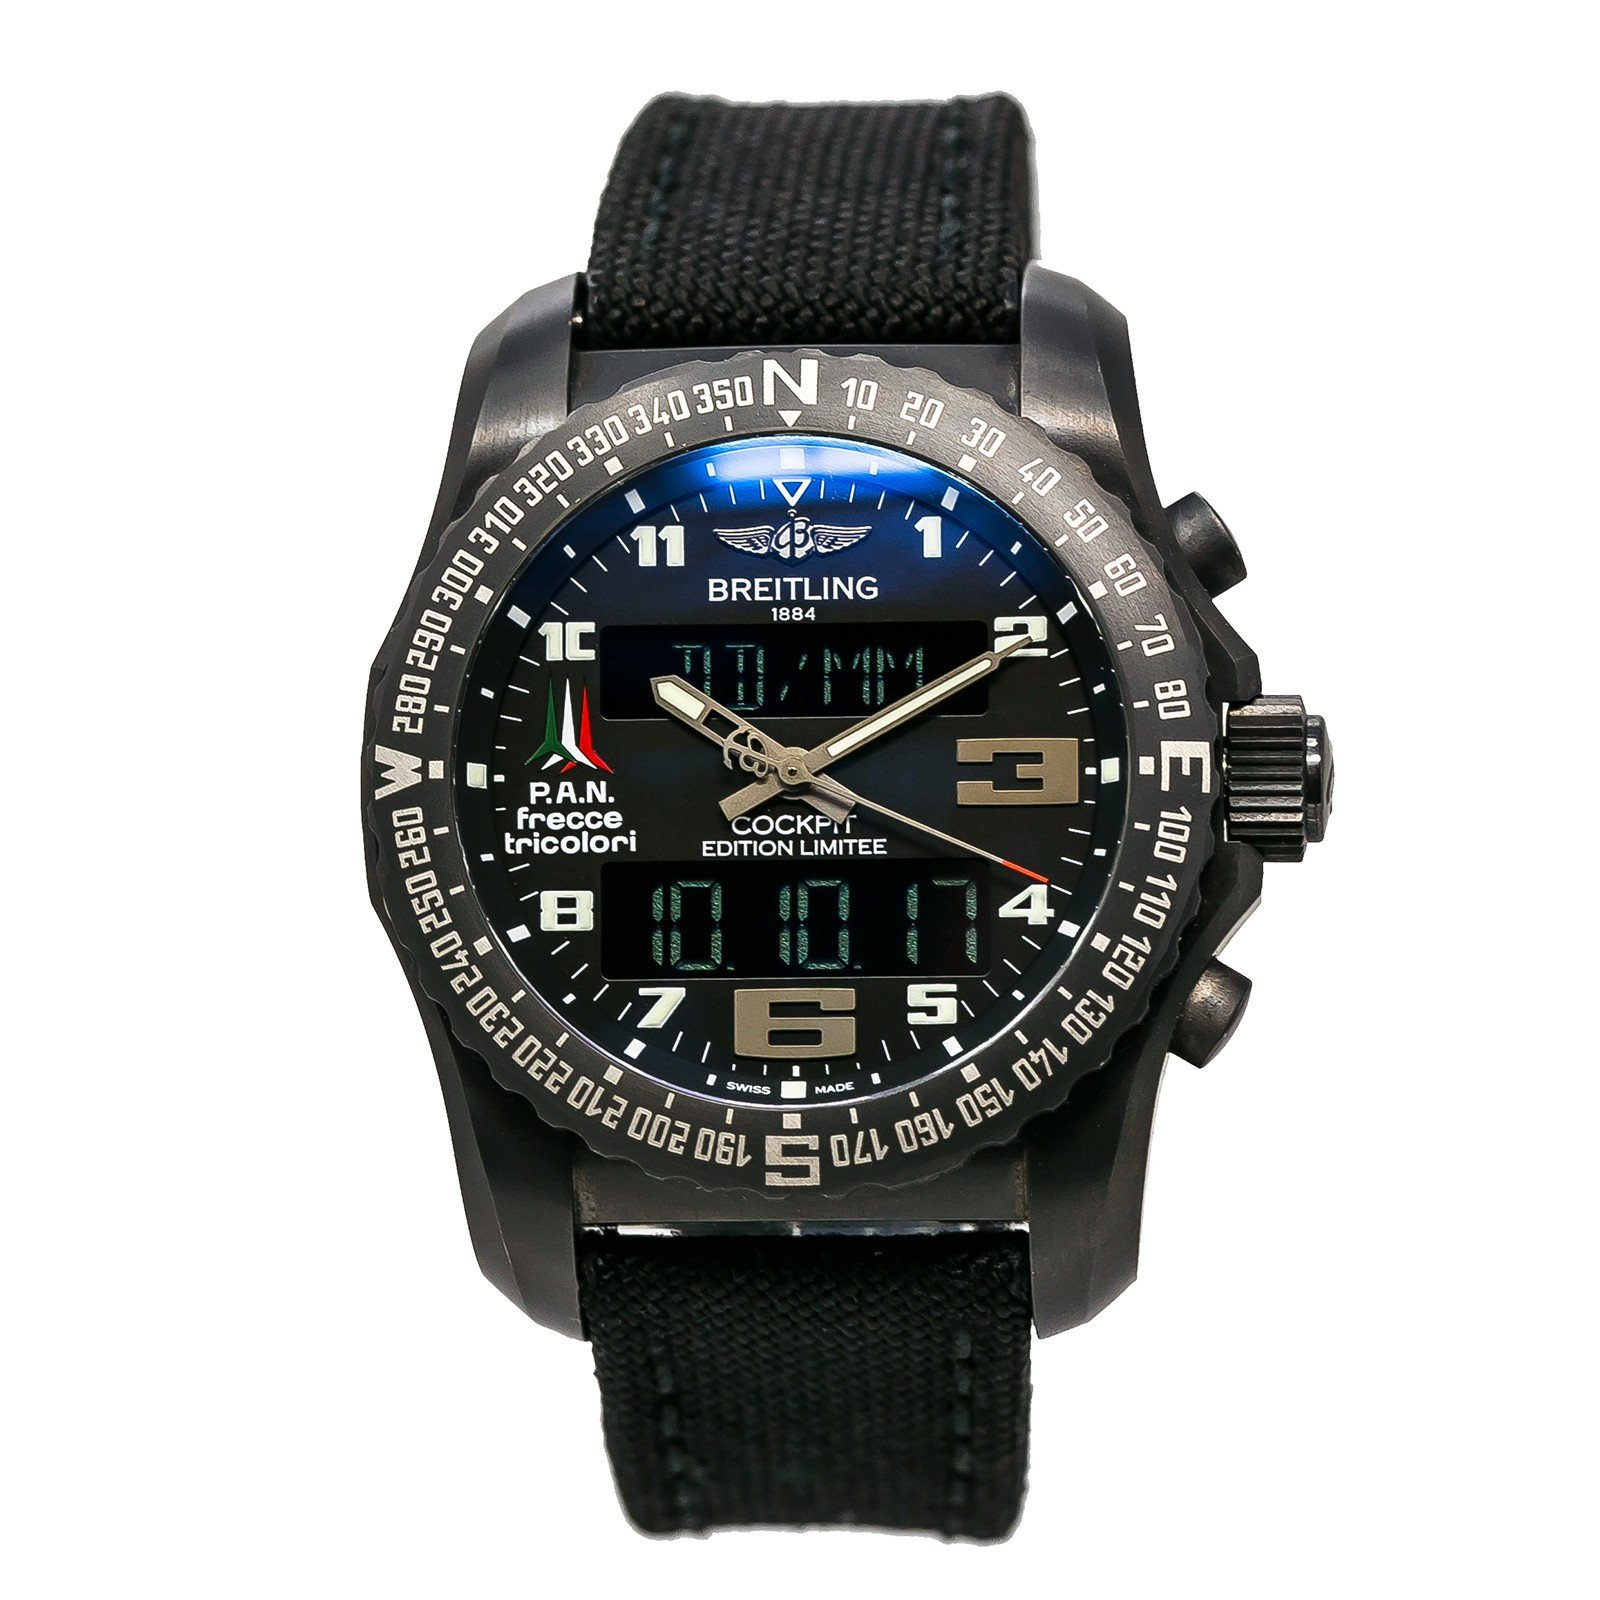 Breitling Cockpit swiss-quartz mens Watch VB5010 (Certified Pre-owned)